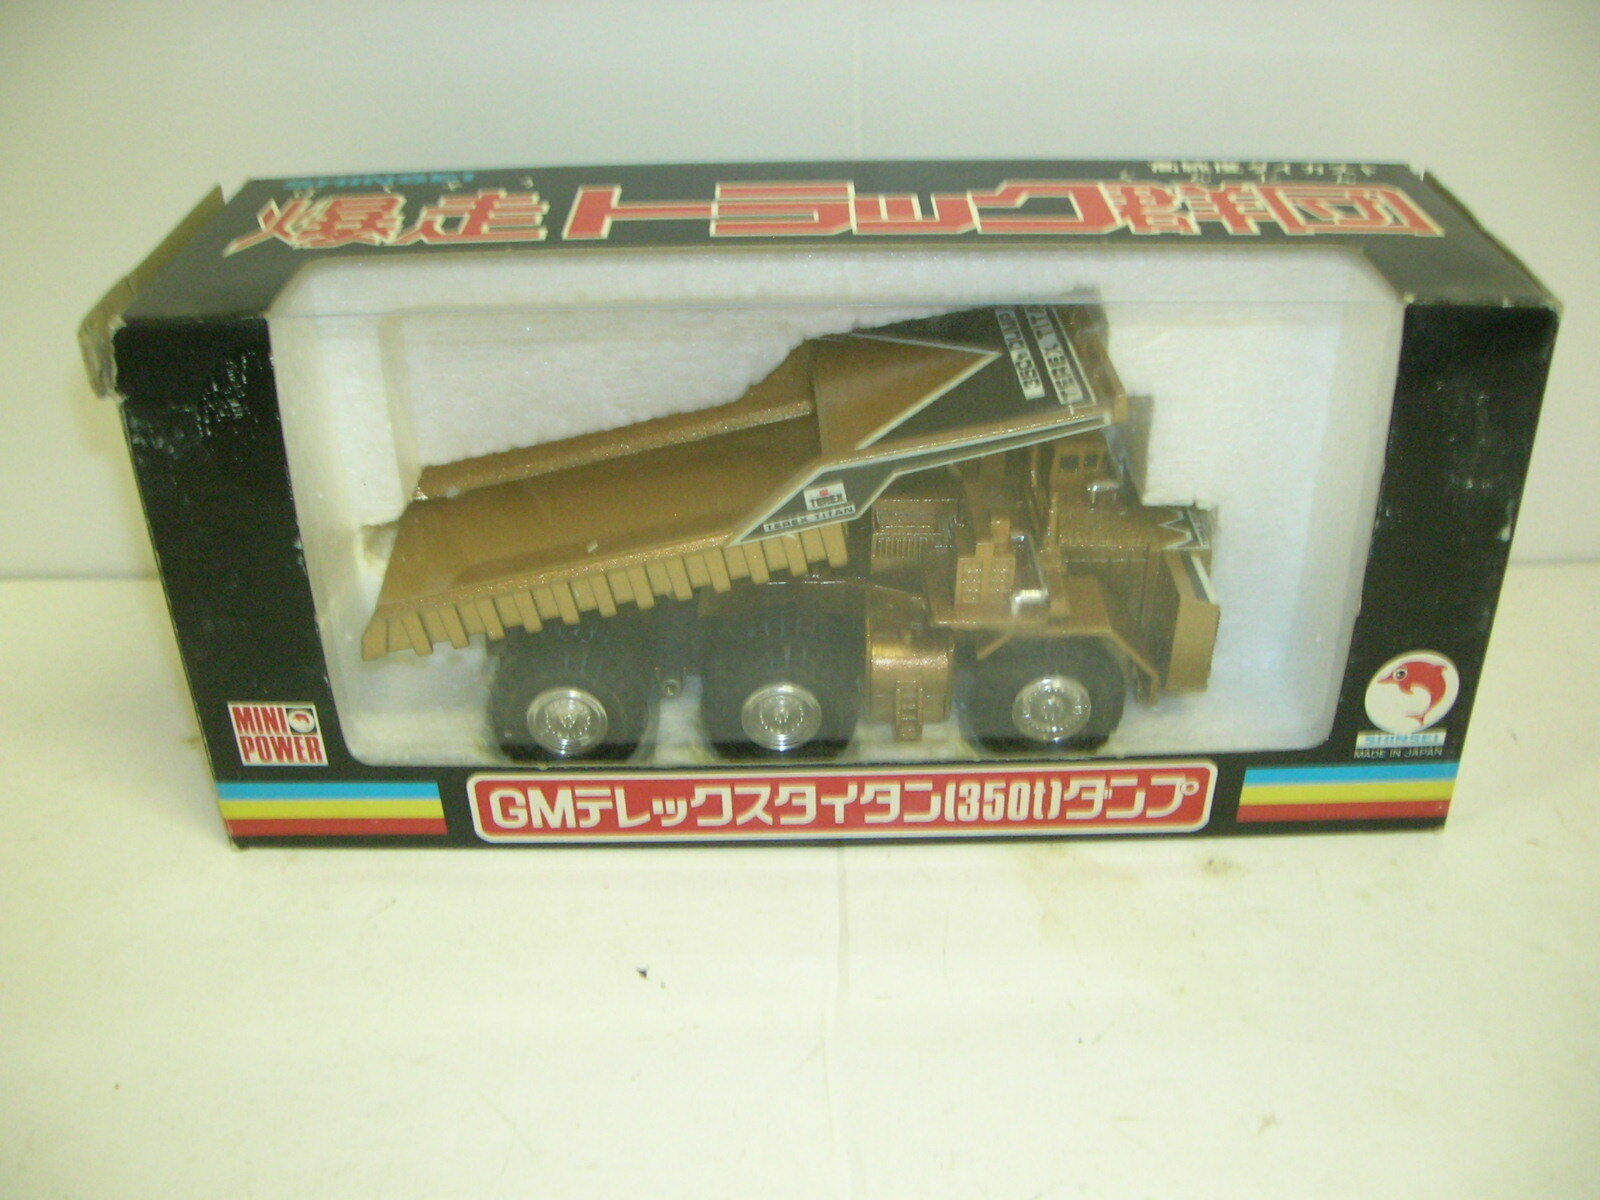 SHINSEI TEREX 33-19 BRONZE W BOX - MAKE OFFERS